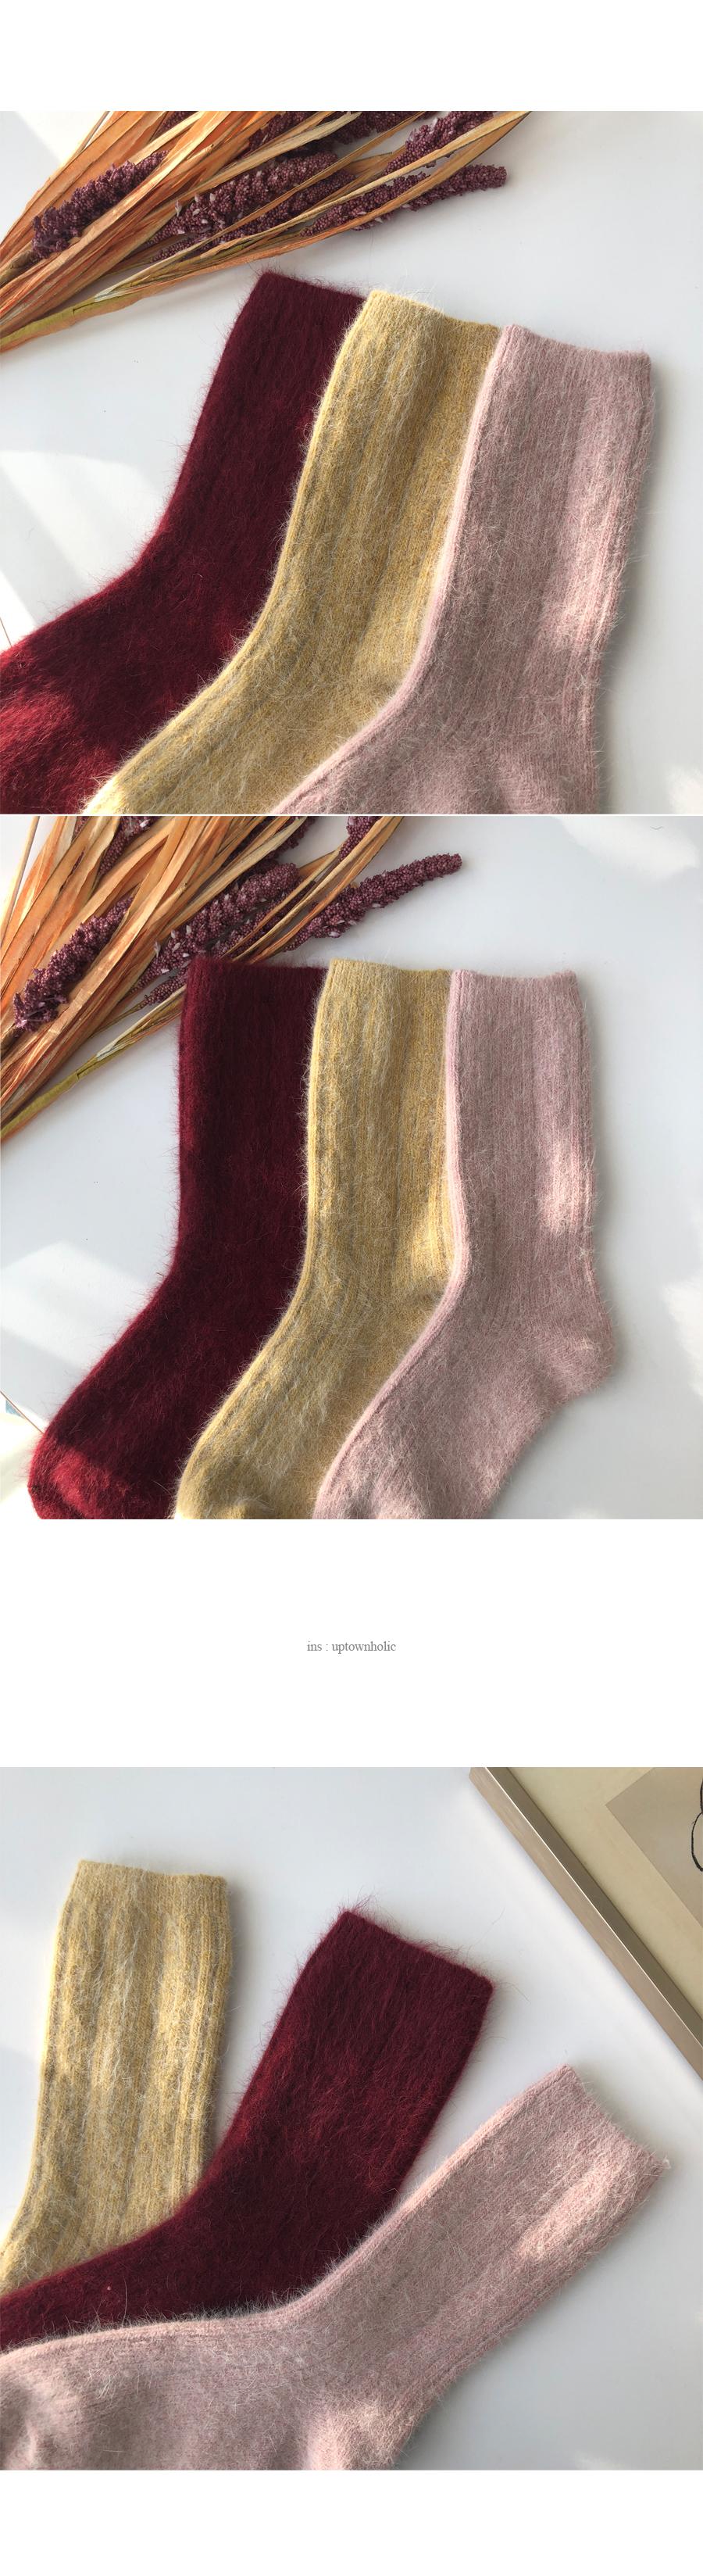 Pretzel socks